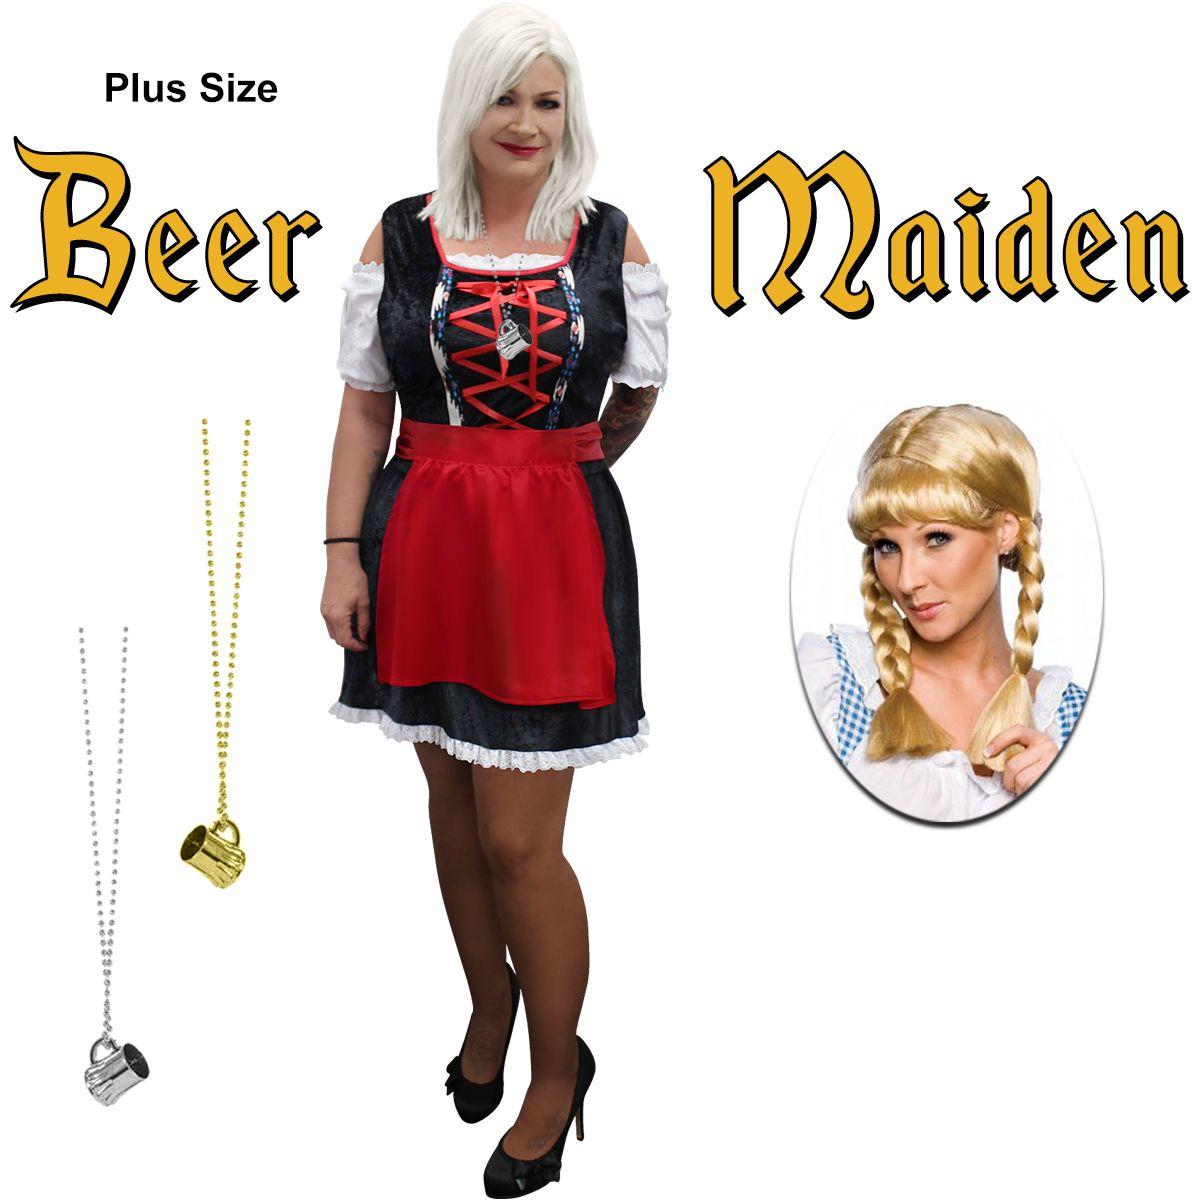 NEW! Plus Size Beer Maiden Halloween Costume Lg XL 1x 2x